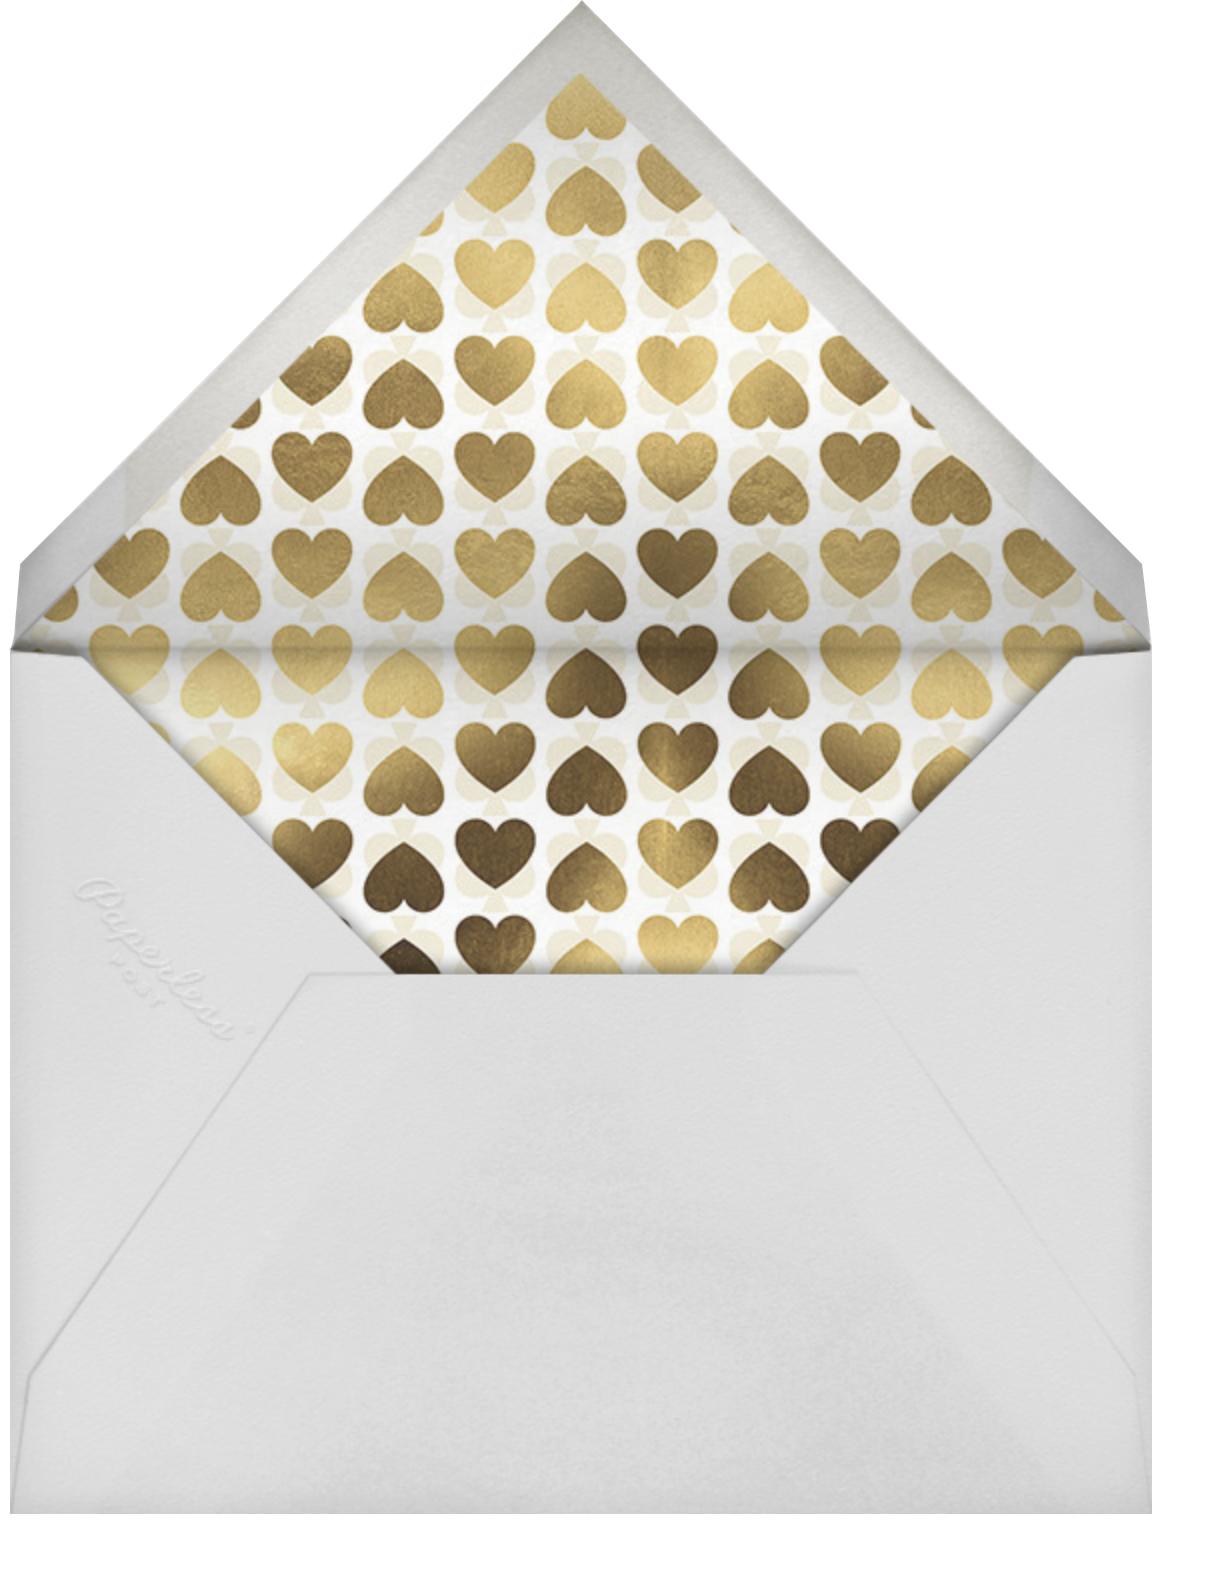 Hearts Of Mine - Black - kate spade new york - Engagement party - envelope back